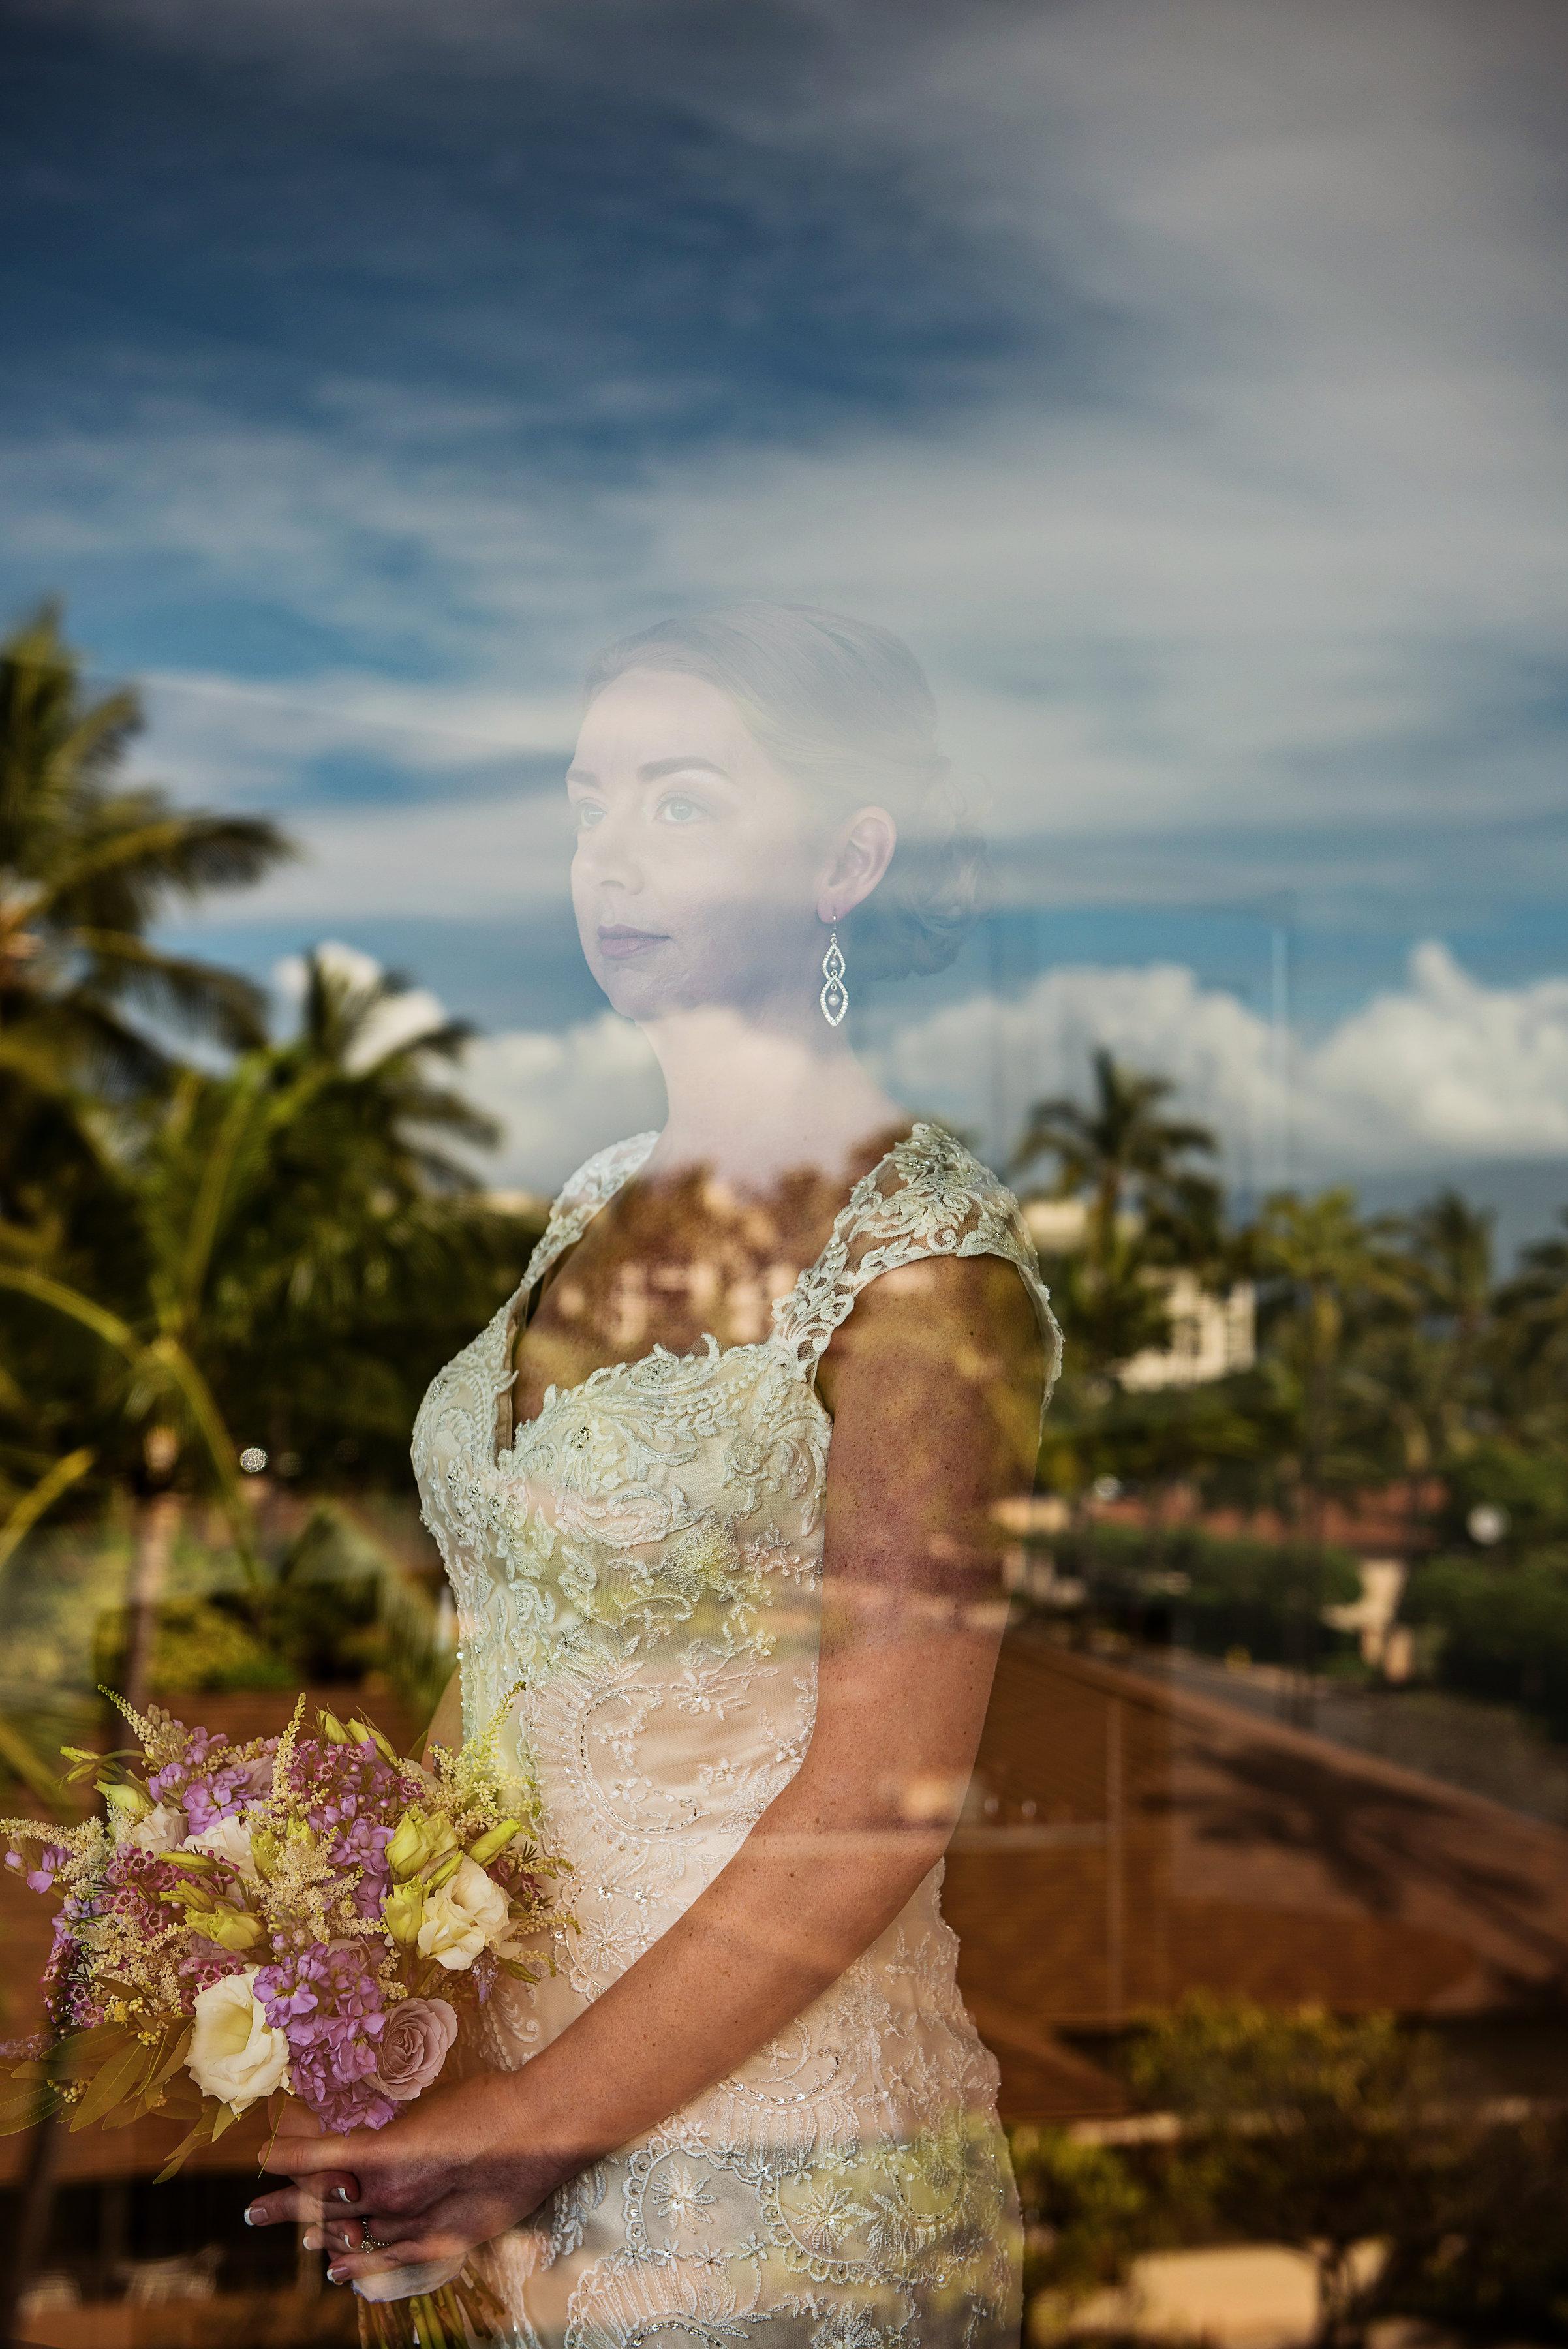 HawaiiWedding-Lisa&Scott-GettingReady-253-2 copy.jpg